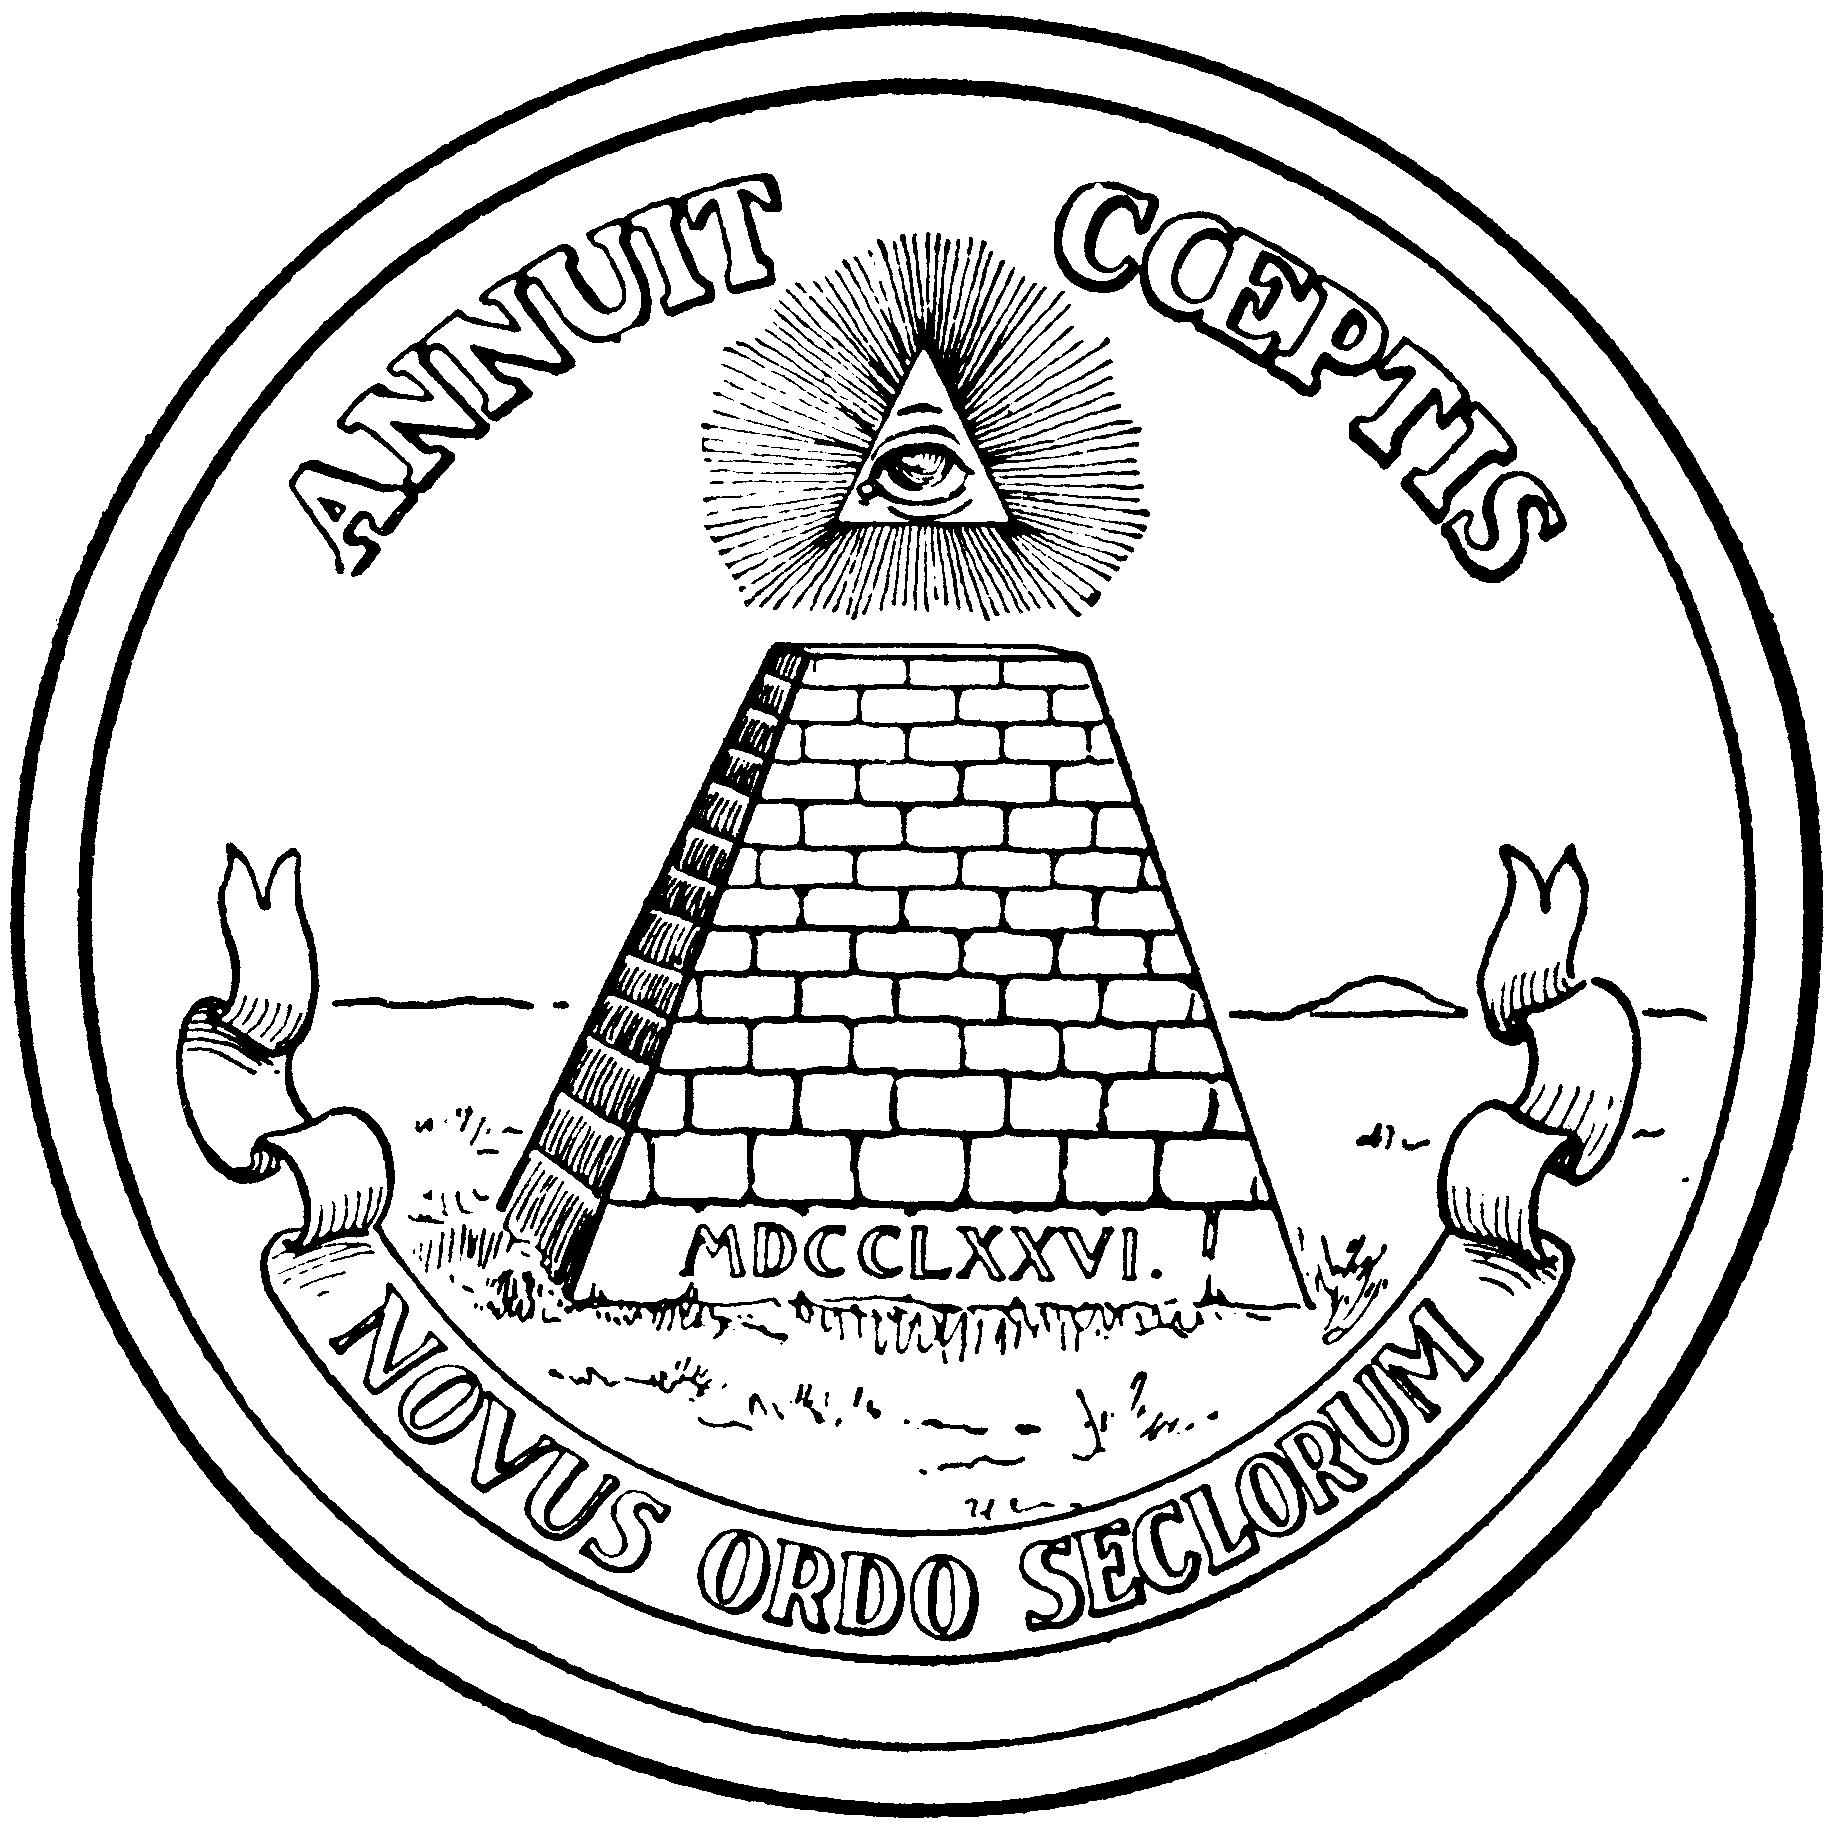 Seclorum Novus Seal Great Annuit Mdcclxxvi Coeptis Ordo